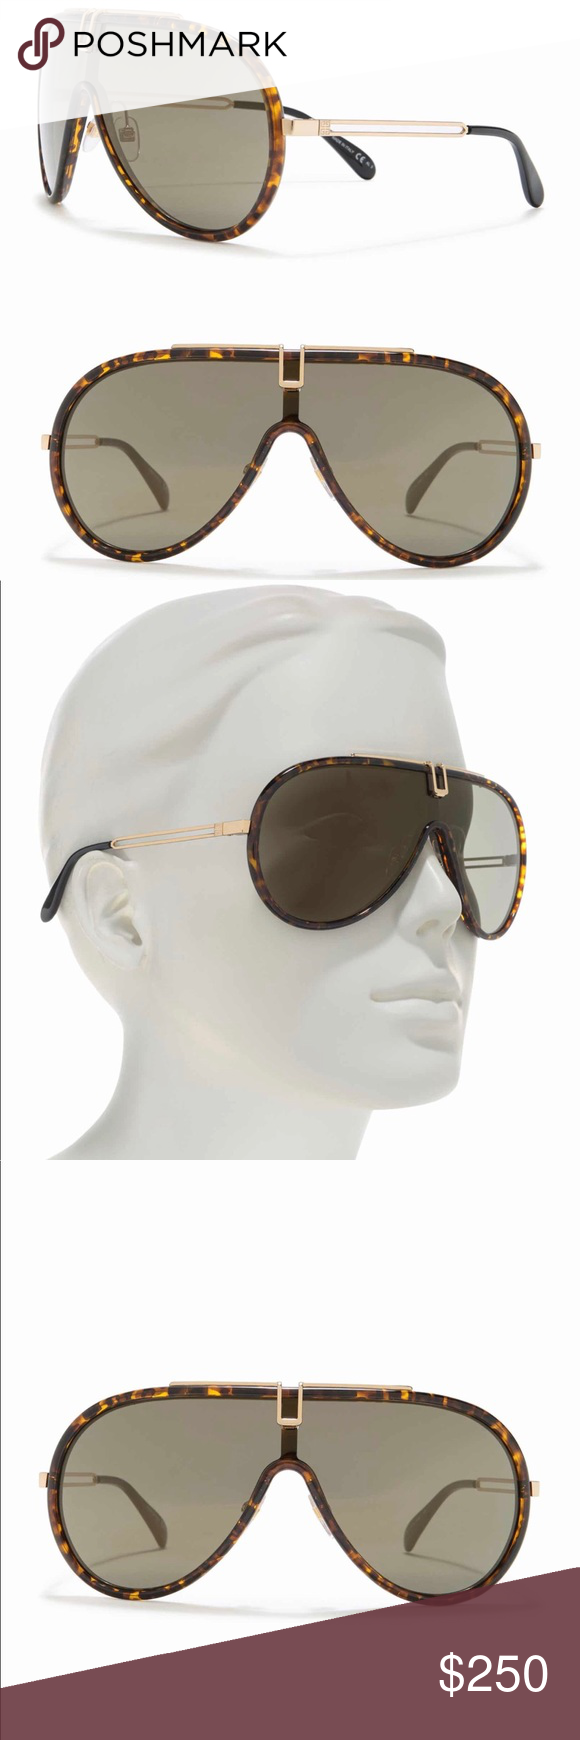 Givenchy 99mm Aviator Sunglasses Aviator Sunglasses Sunglasses Givenchy